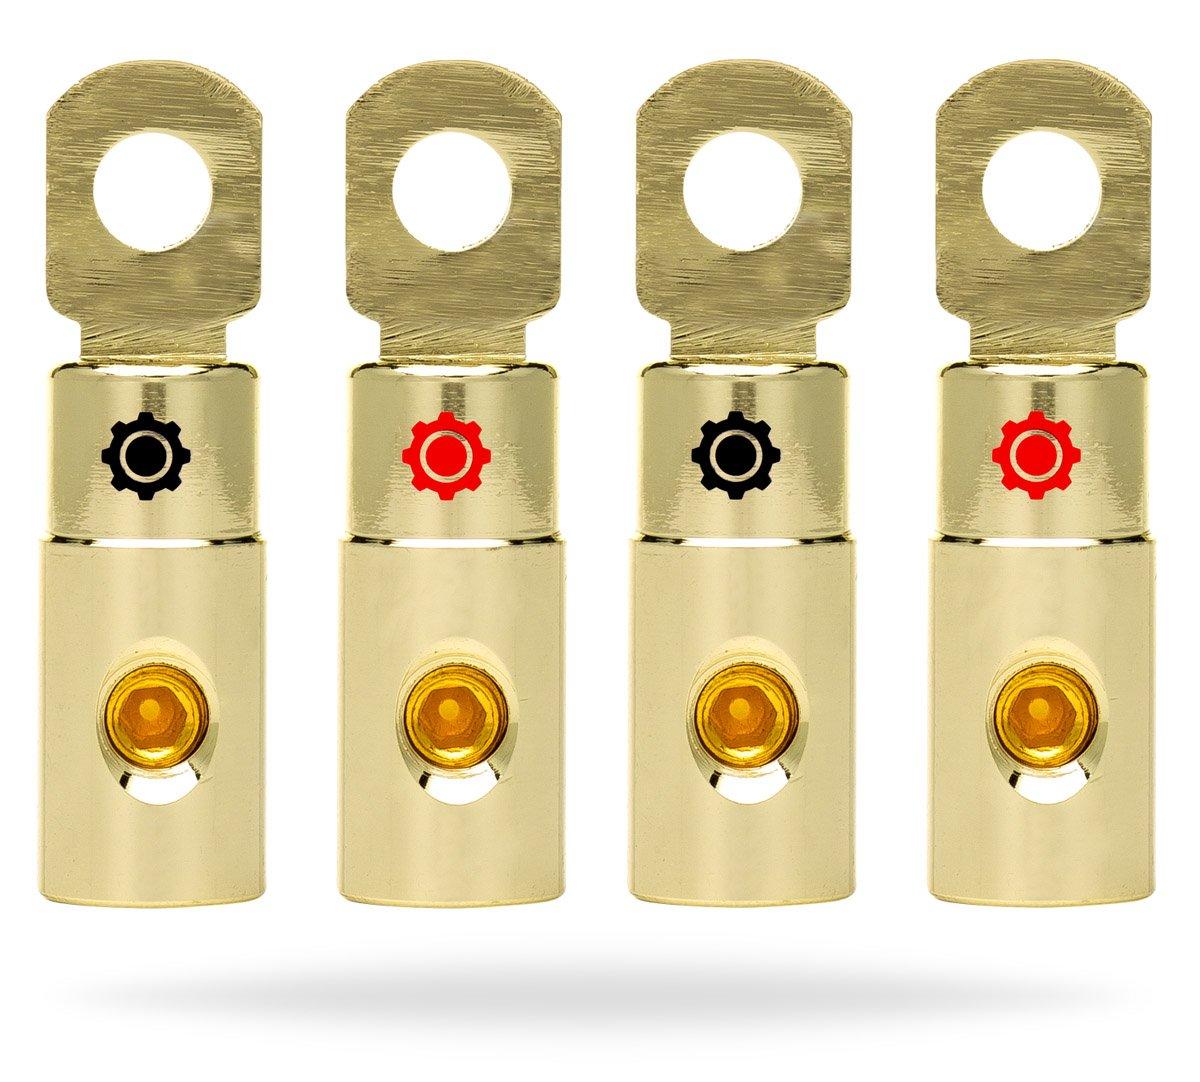 Db Link Pk4z 4 Gauge Power Series Amp Installation Kit: Amazon.com: Kinetik HC600 BLU Series 600-Watt 12-Volt High